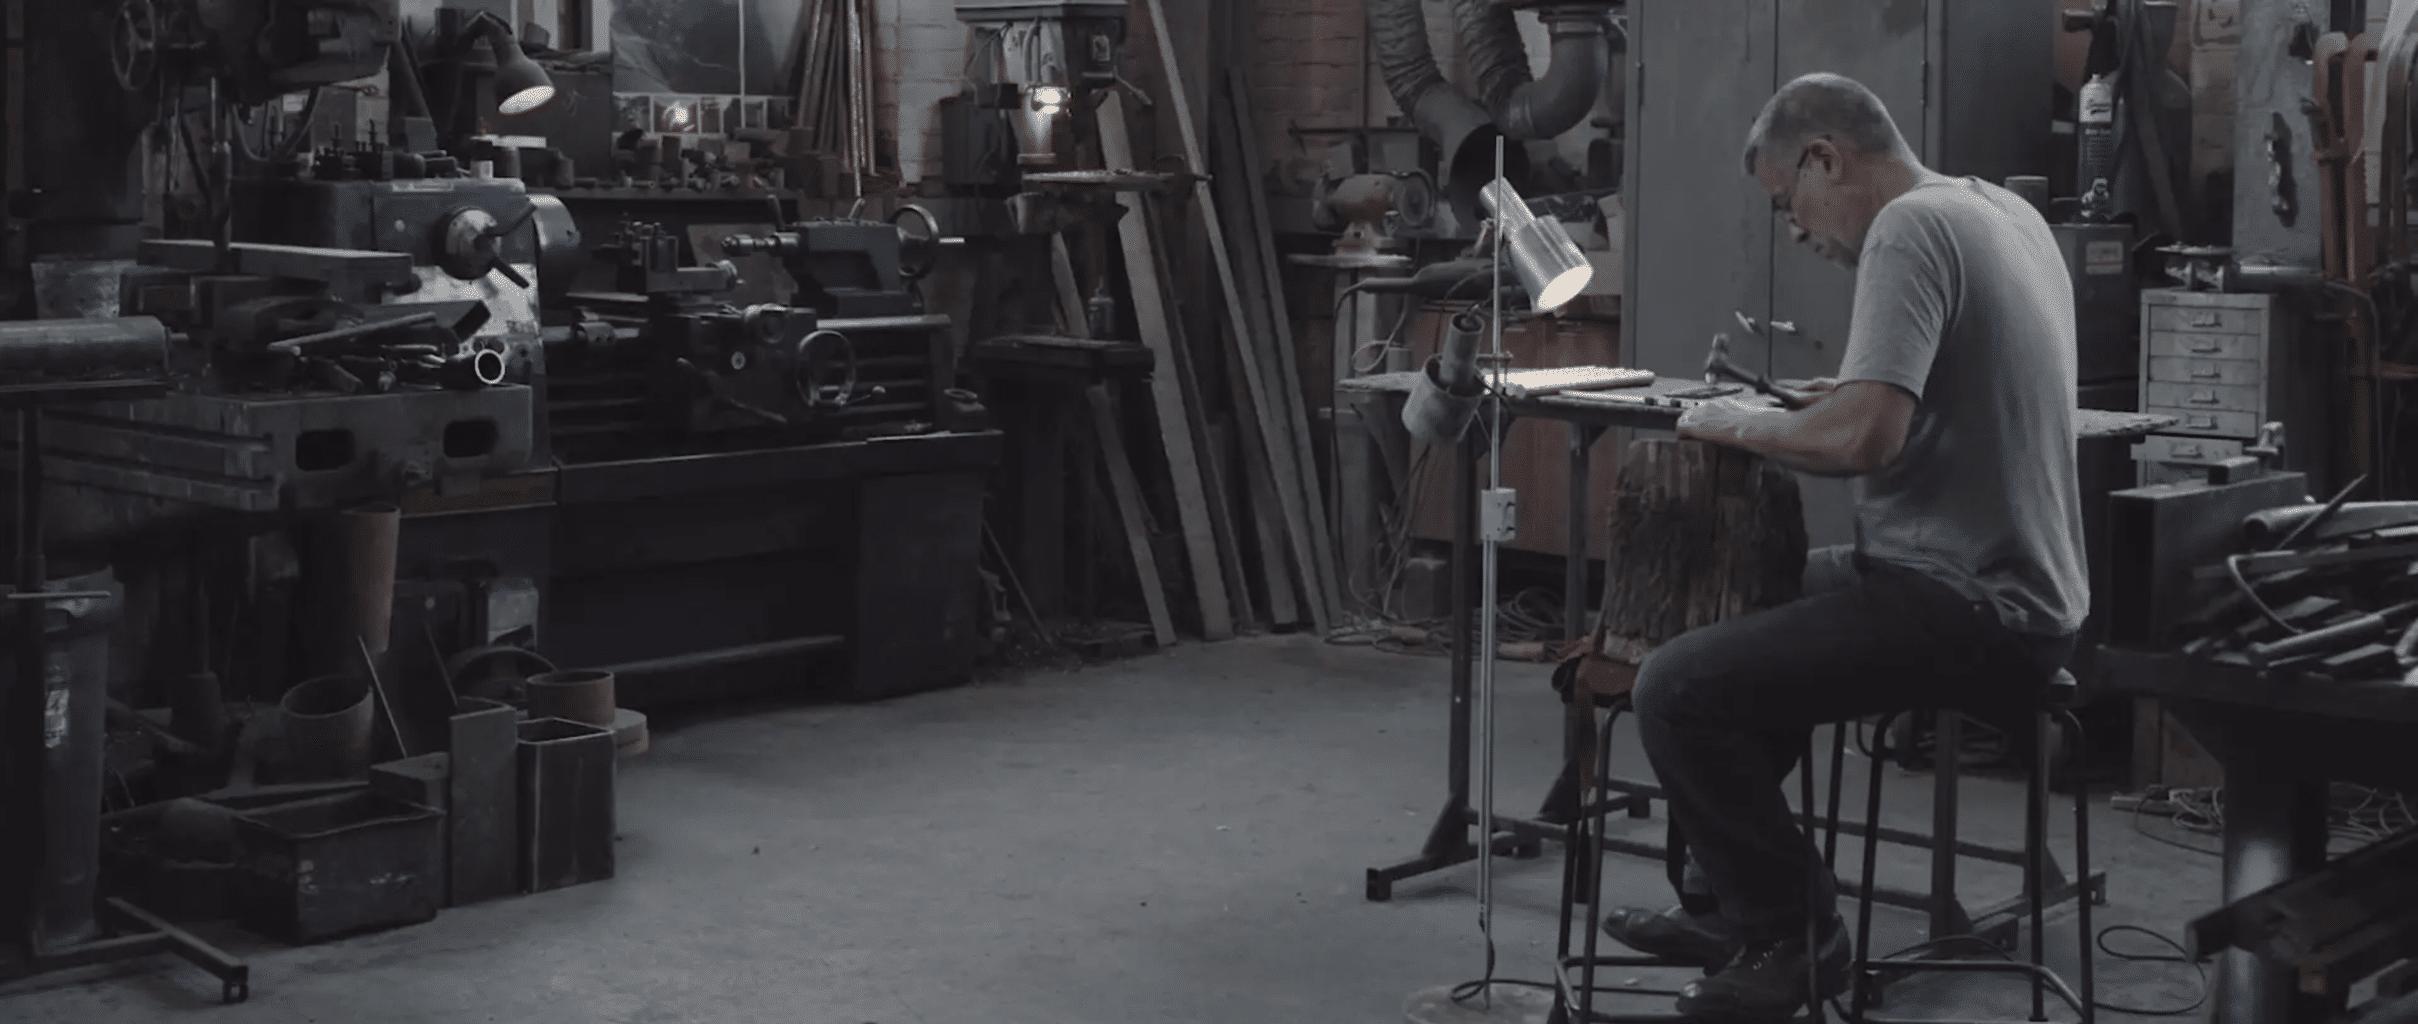 man in workshop hammering